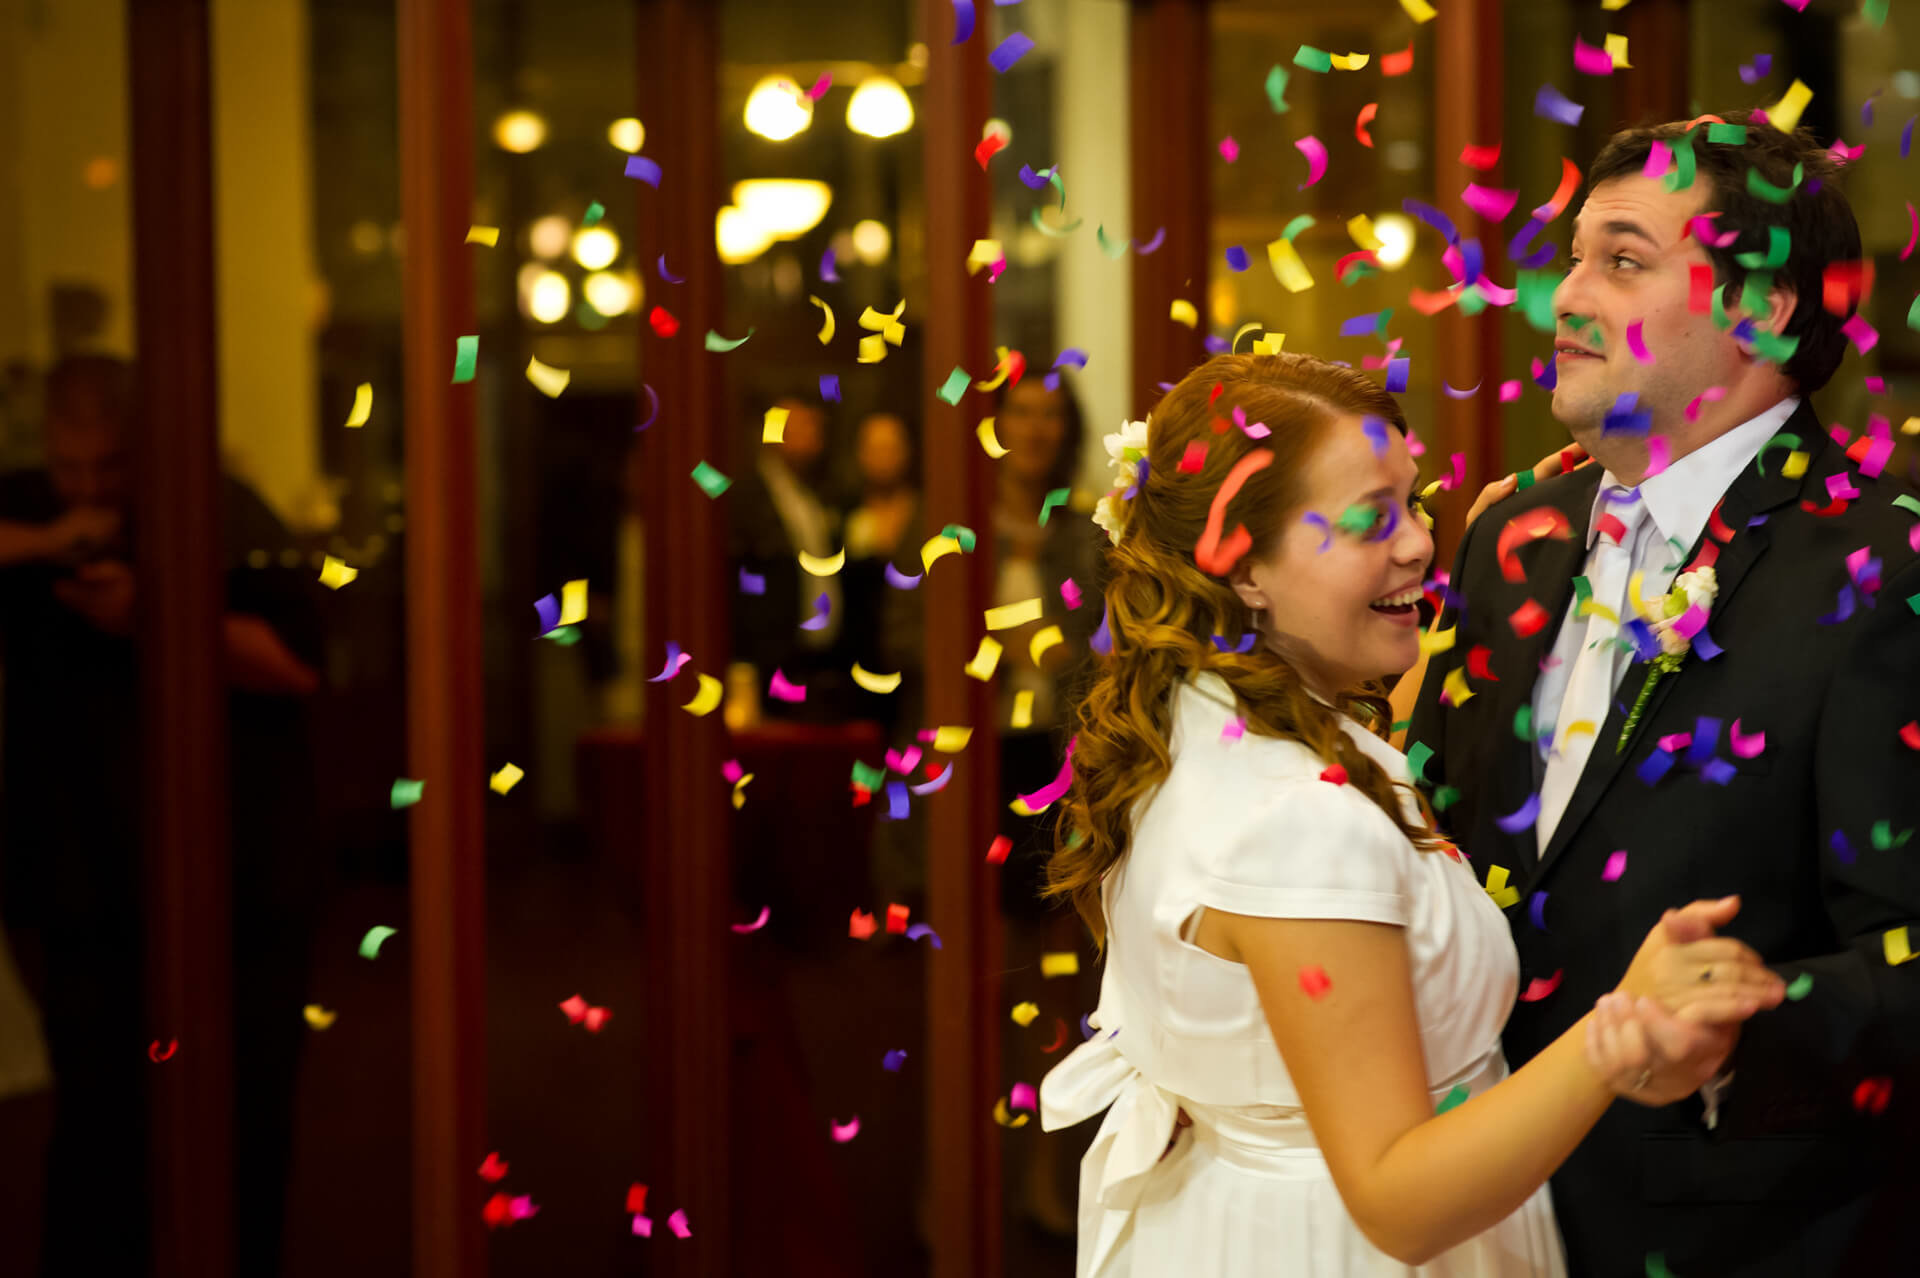 svadba svadobny zabava hostina profesionalne fotenie fotograf Peter Norulak Kosice__11